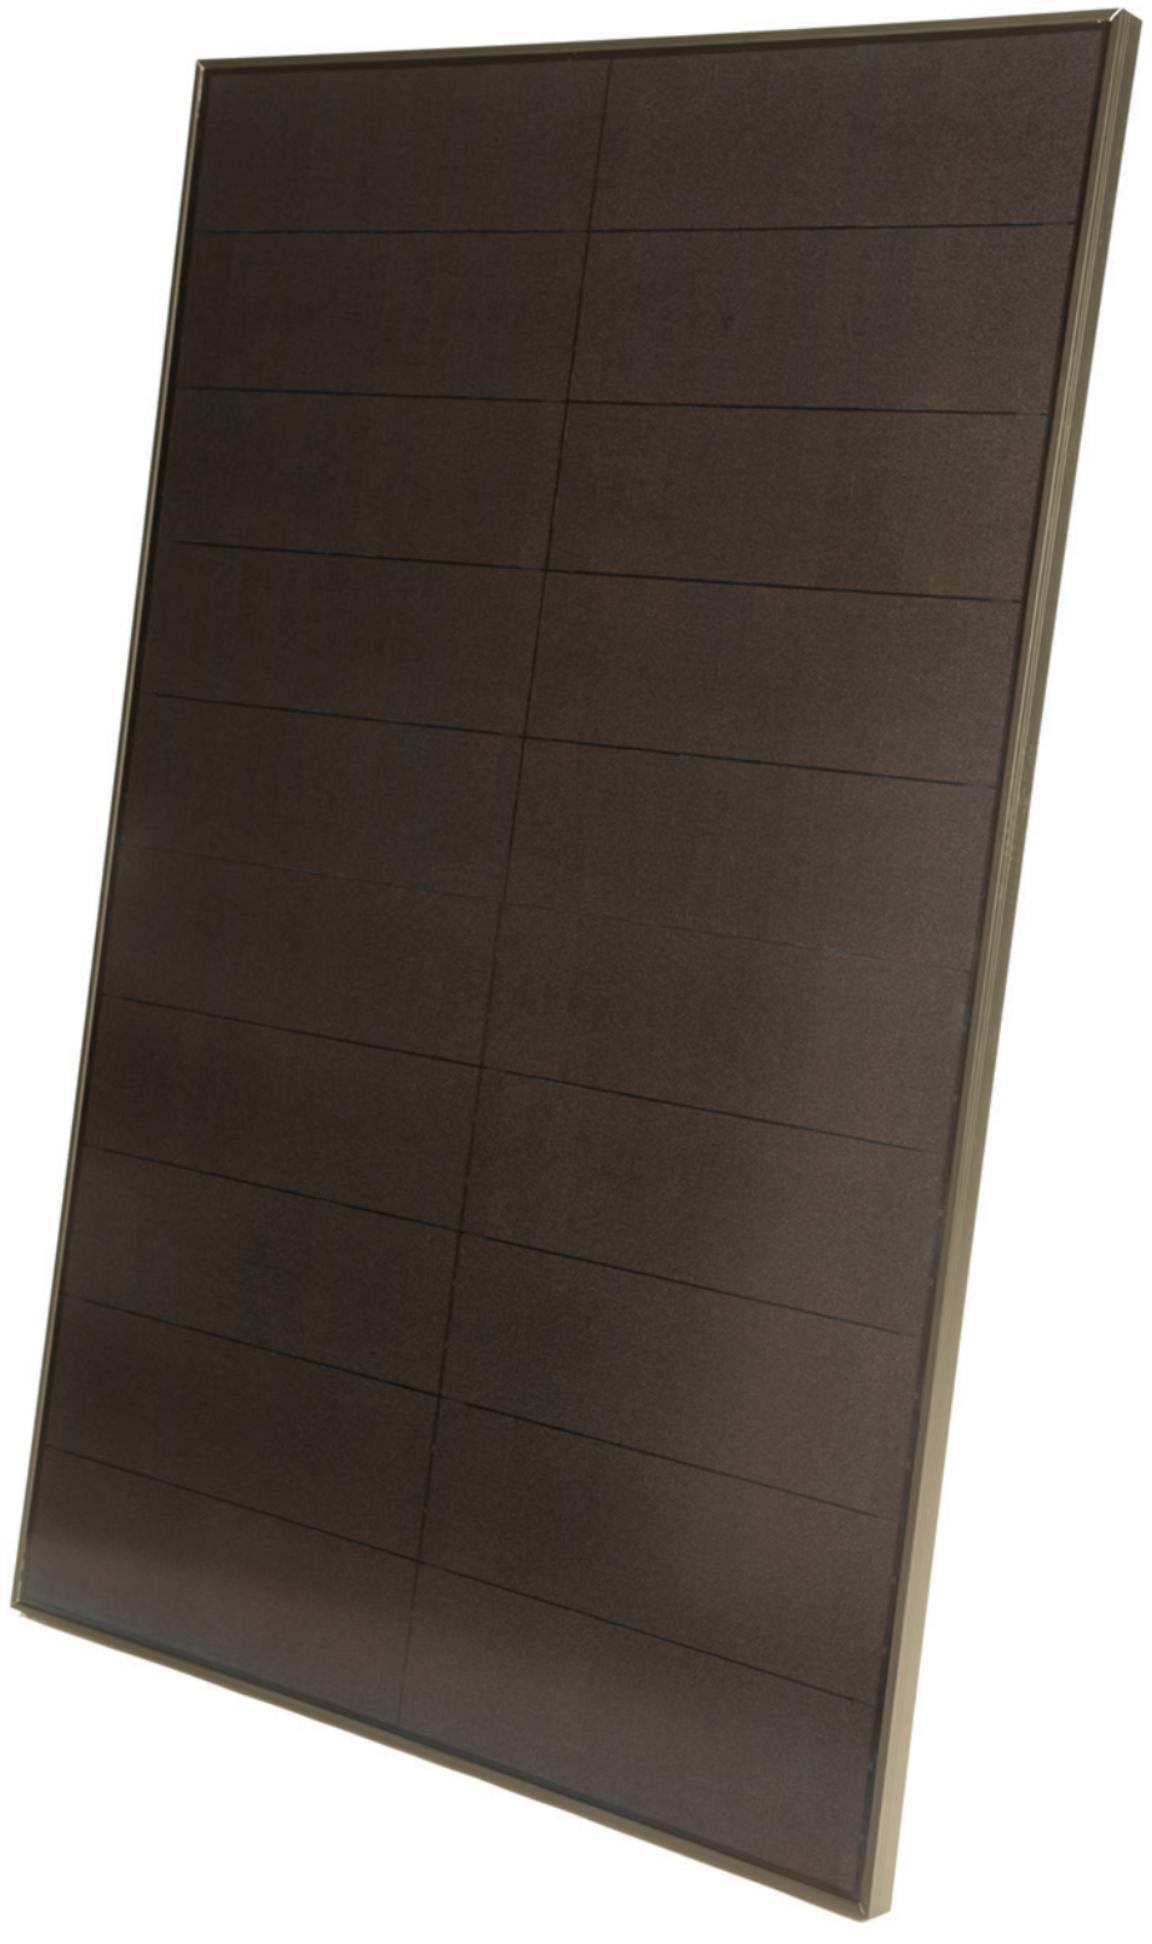 TSC PowerHome PowerXT-360-PD aurinkopaneeli